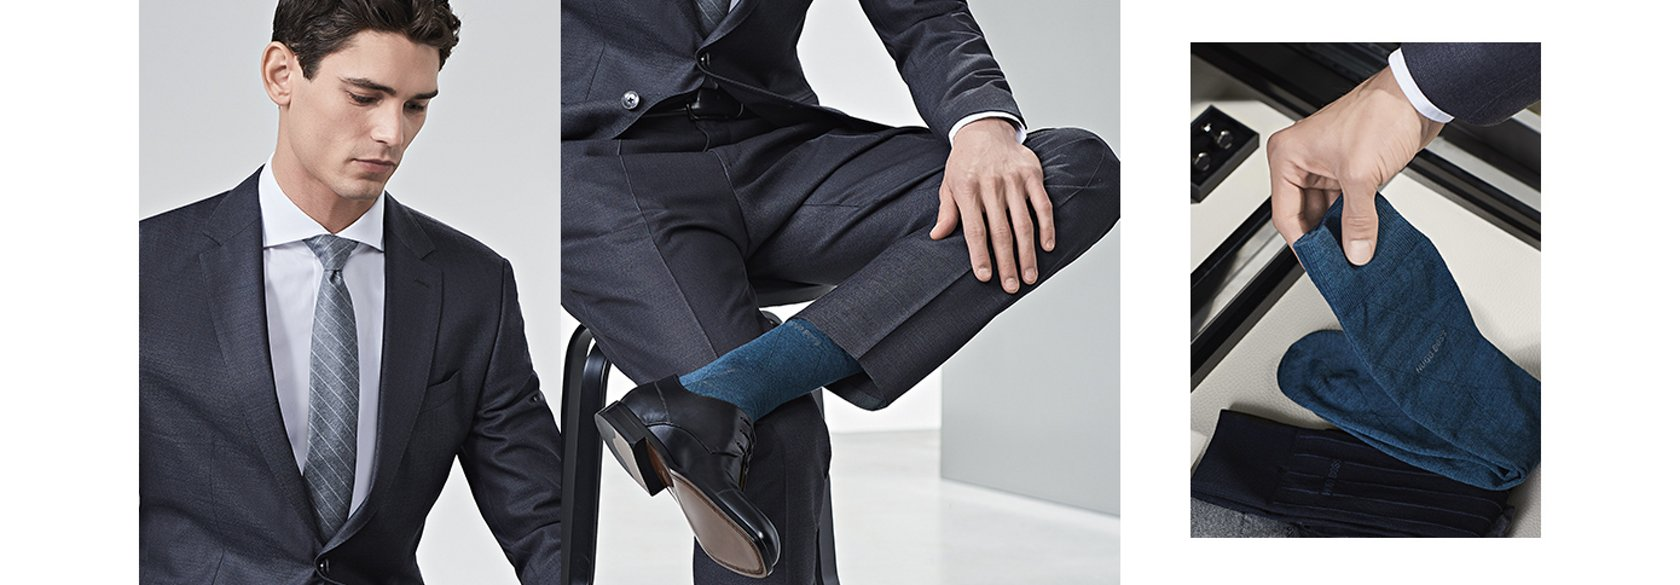 Boss Ratgeber Die Passenden Socken Zum Anzug Hugo Boss